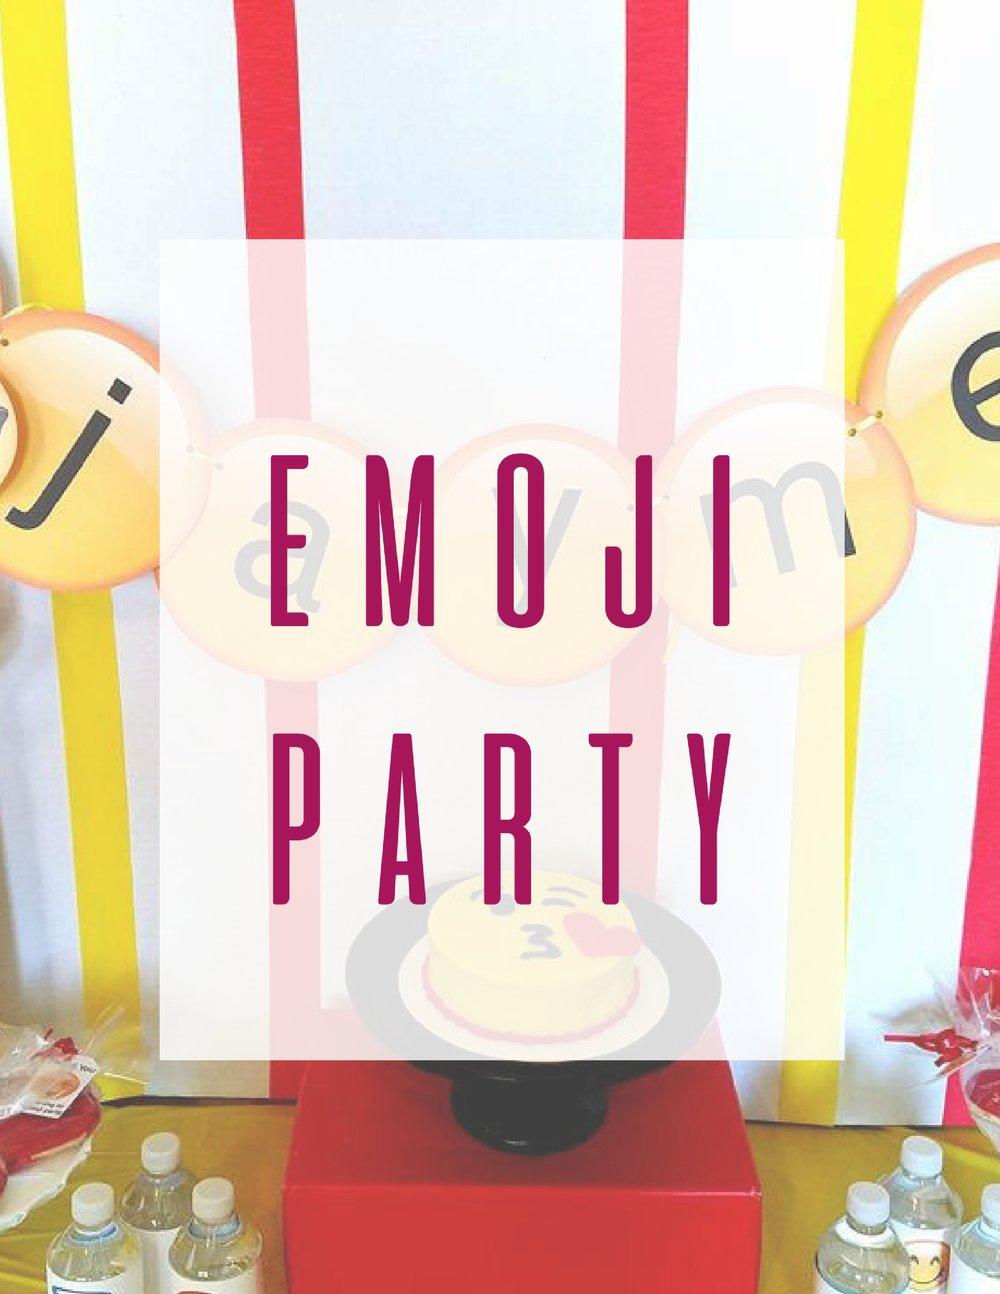 LIBRARY- EMOJI PARTY.jpg